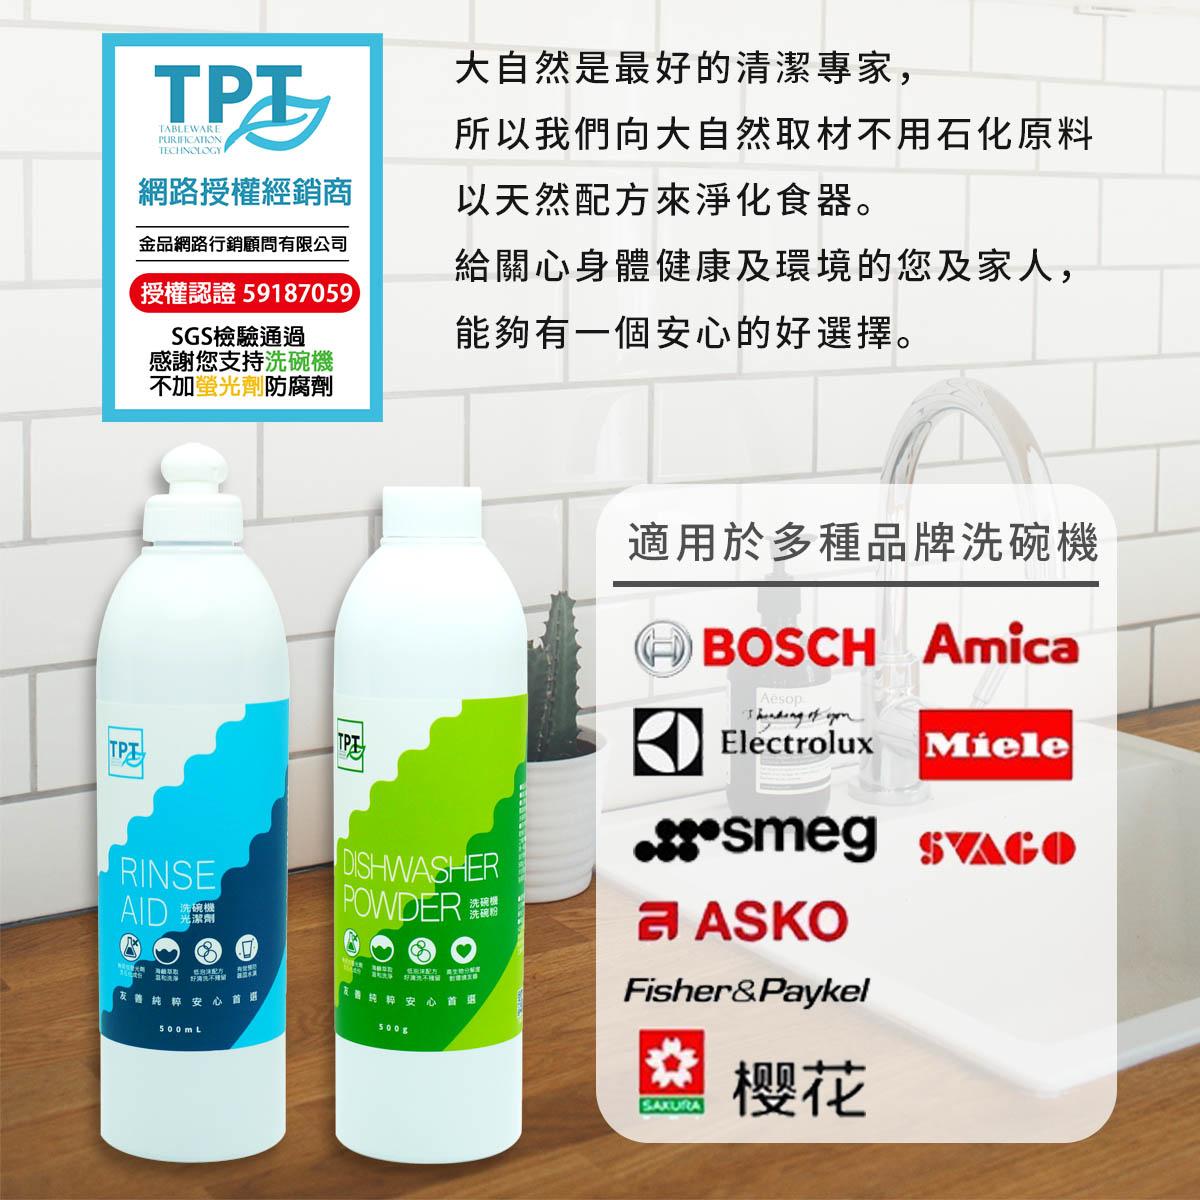 TPT授權經銷商